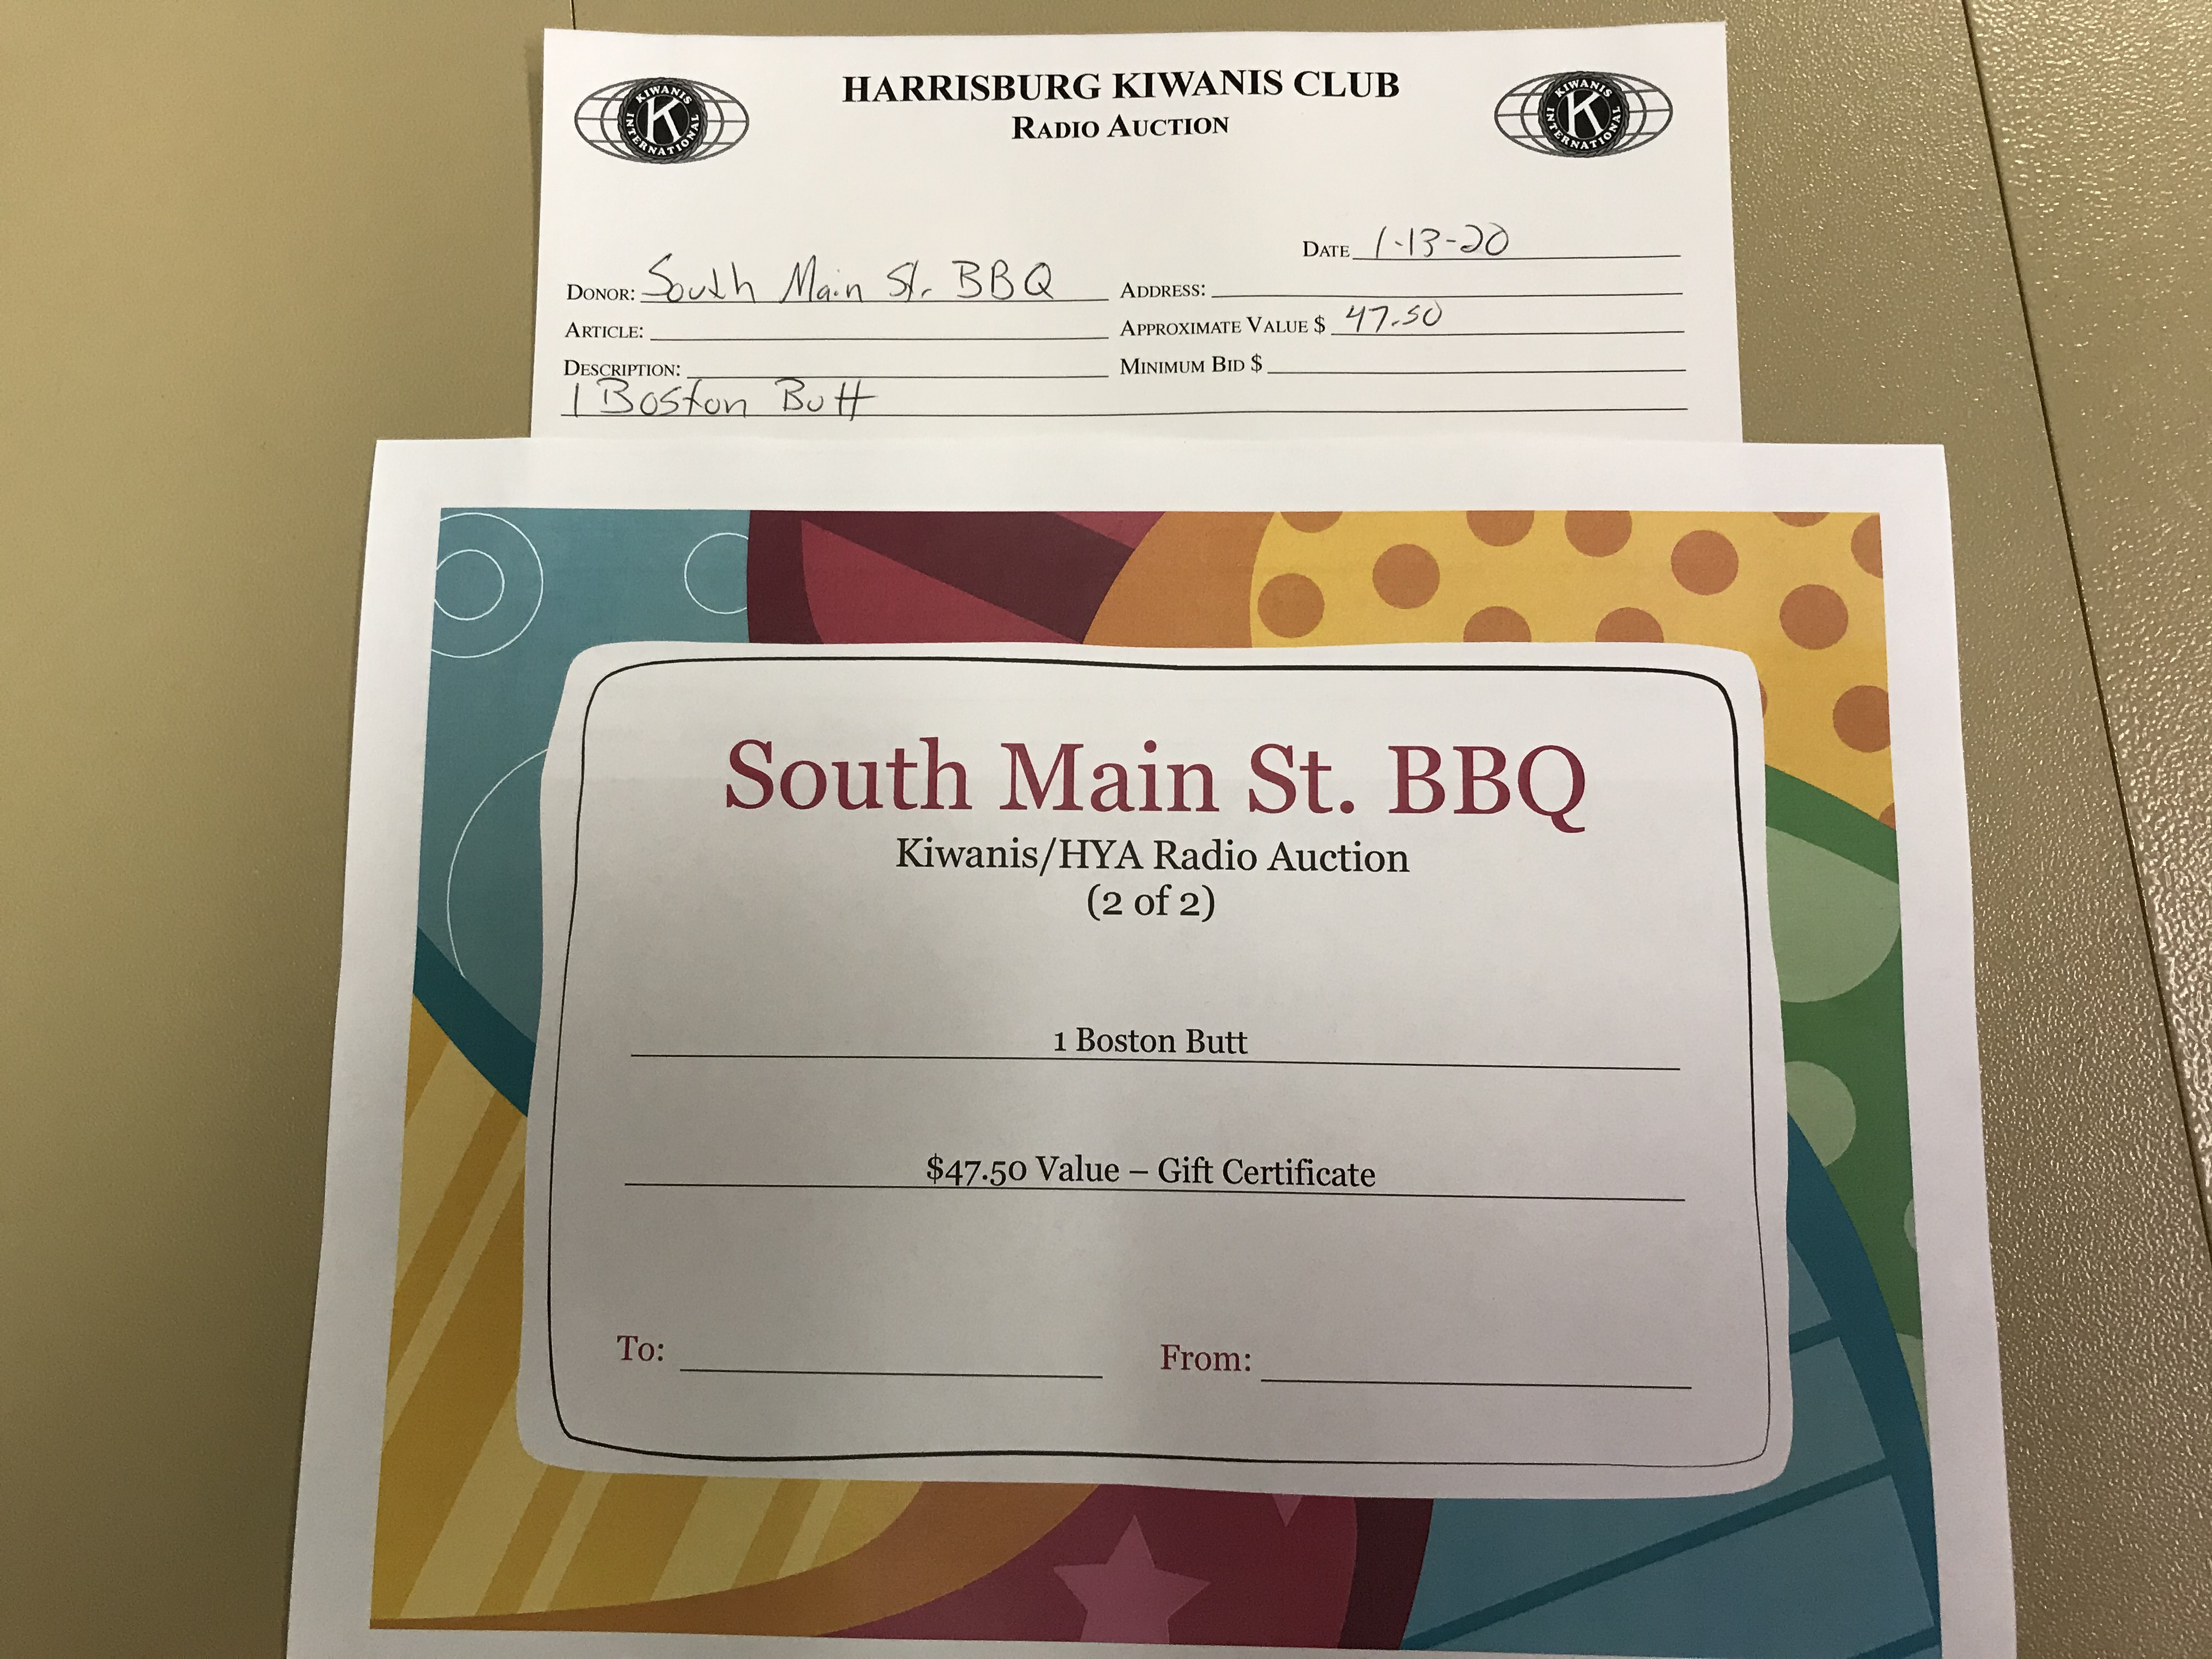 Item 416 - South Main St. BBQ 1 Free Boston Butt